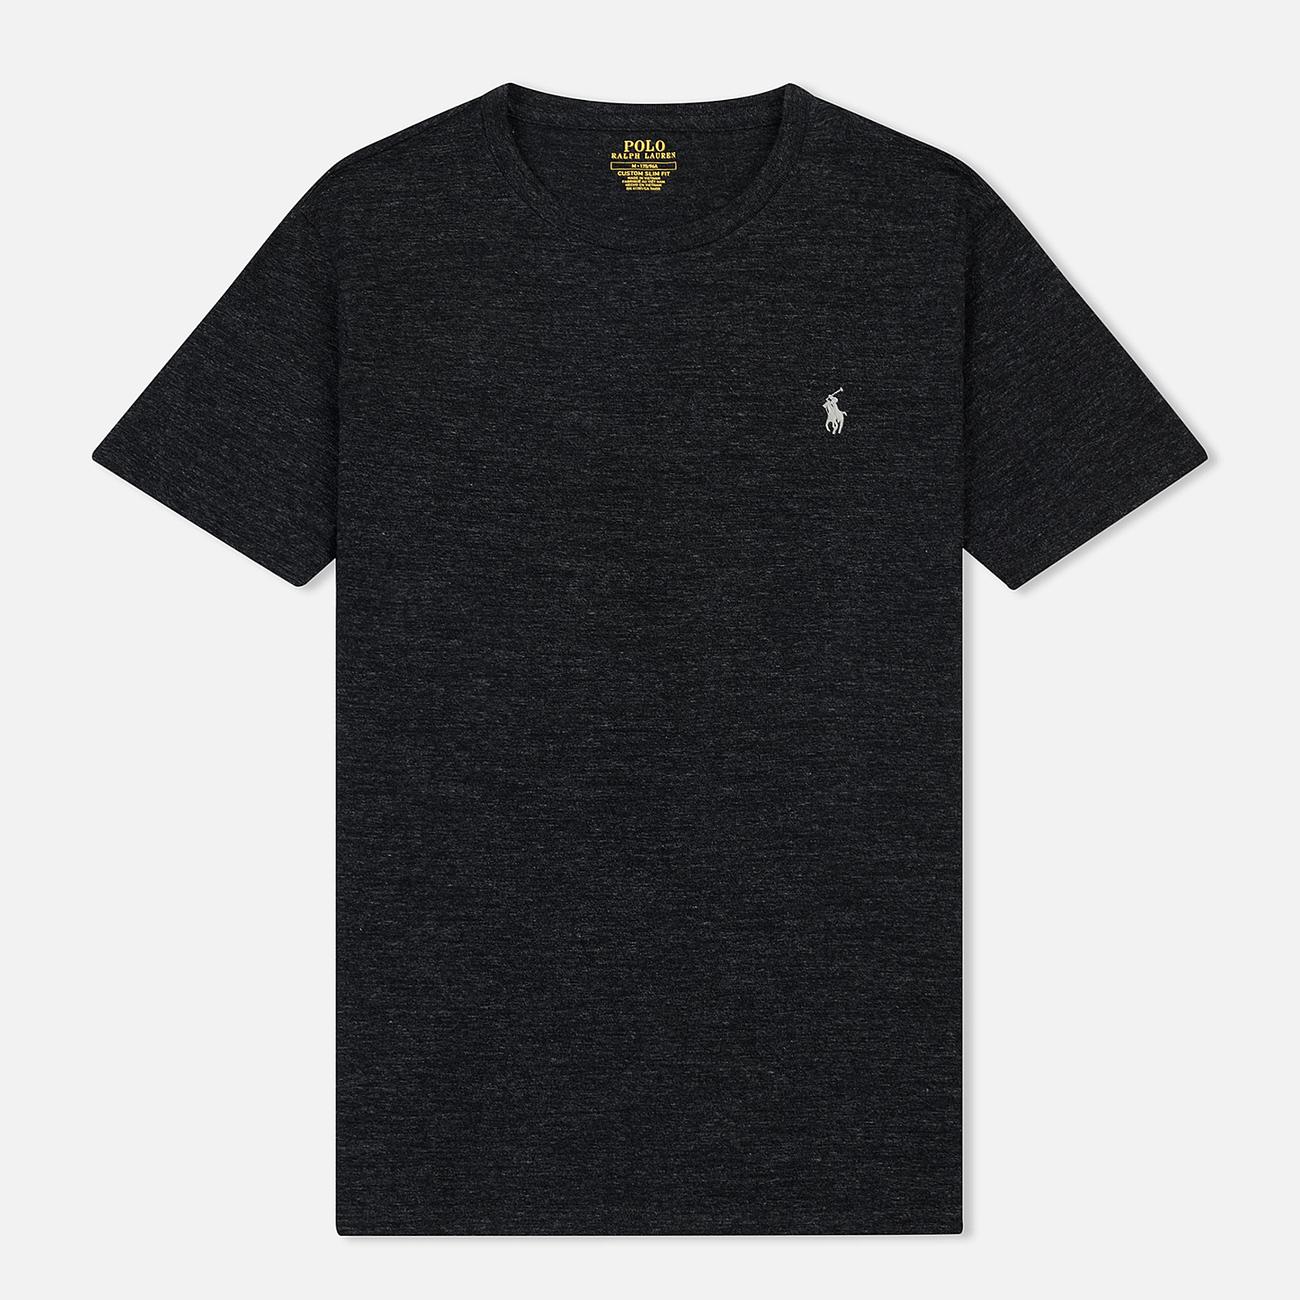 Мужская футболка Polo Ralph Lauren Classic Crew Neck 26/1 Jersey Black Marl Heather